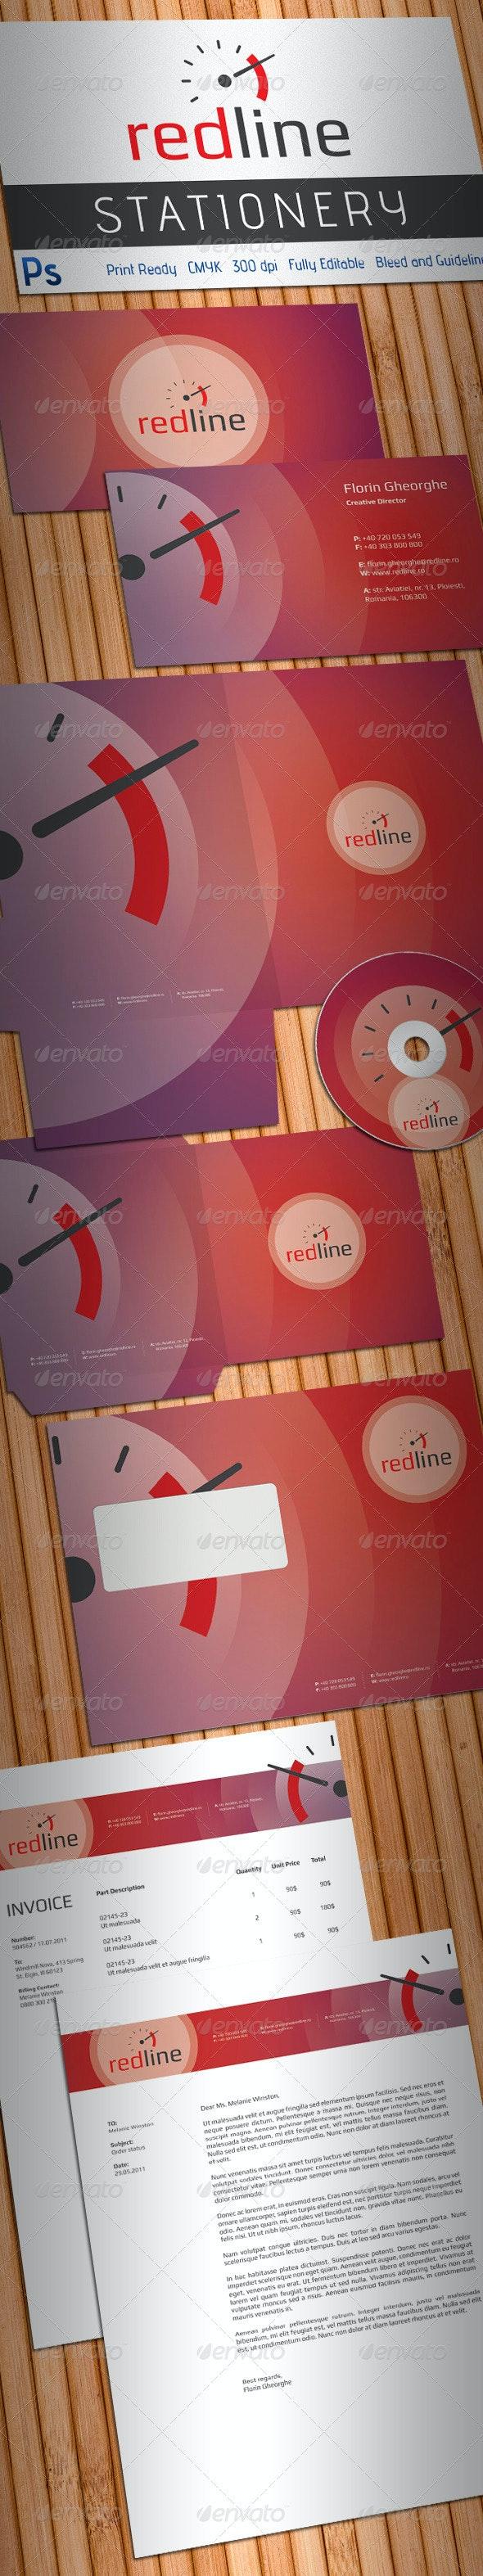 Redline High Performance Auto Parts Stationery - Stationery Print Templates